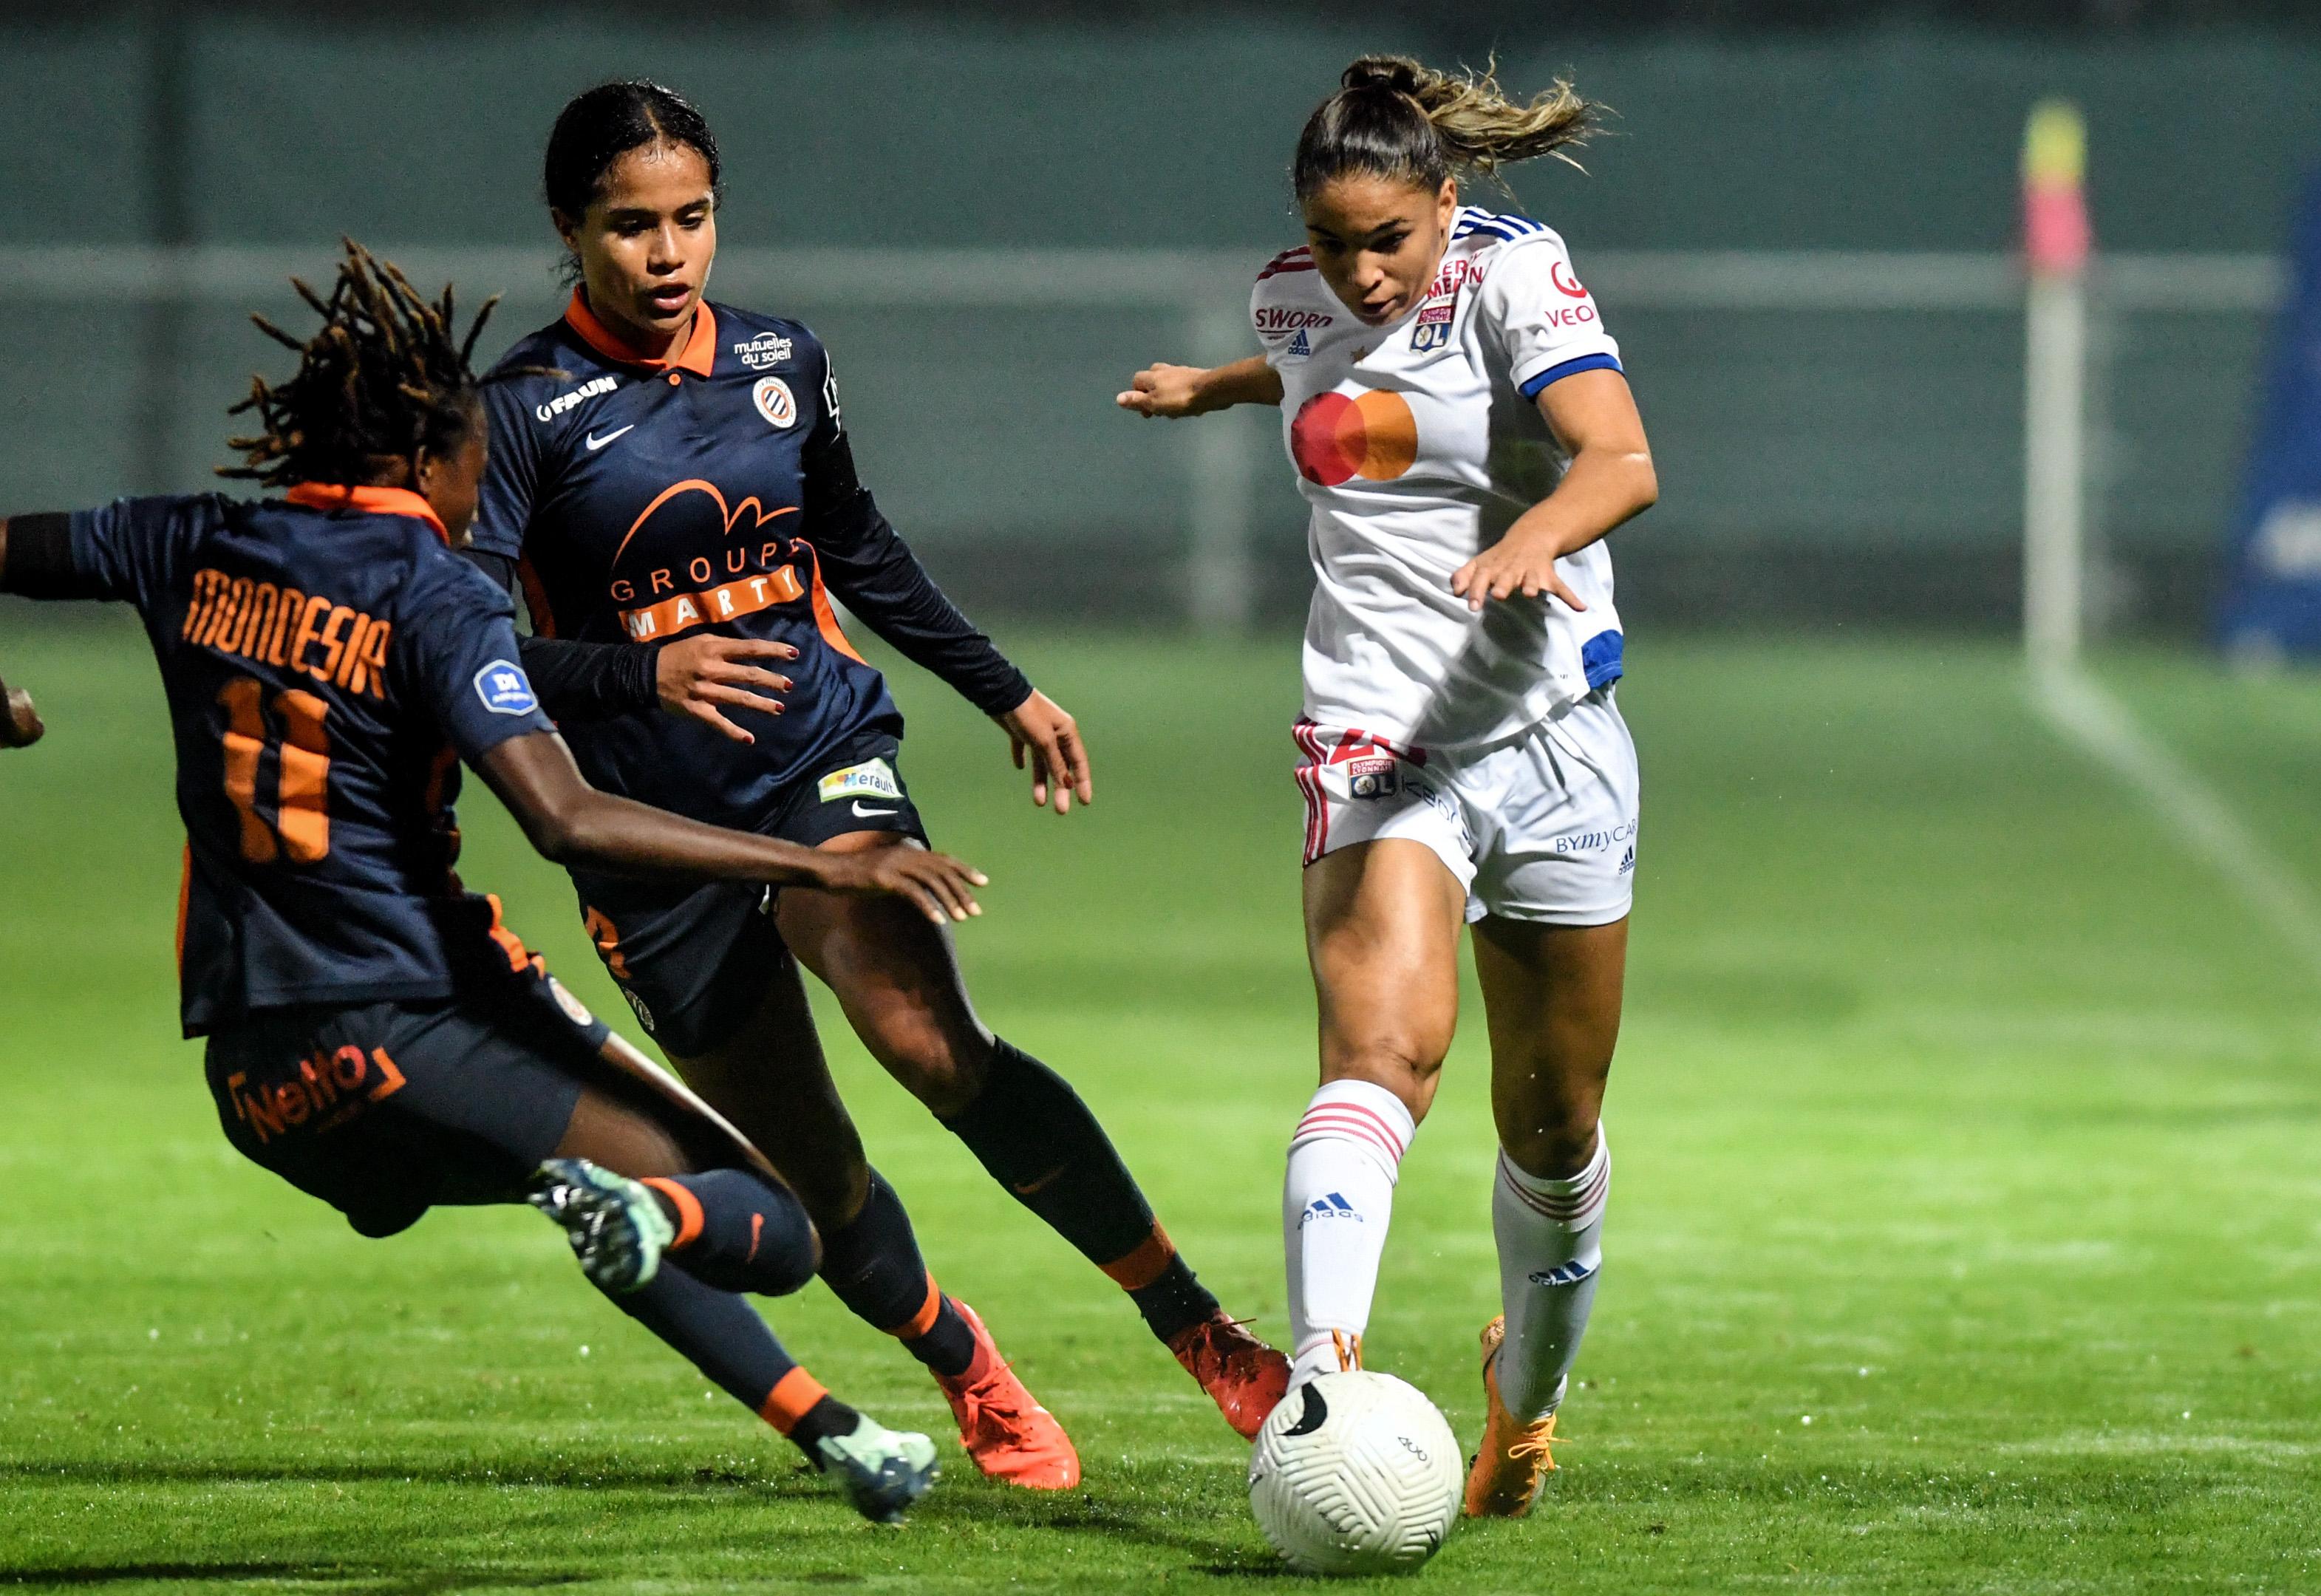 Montpellier HSC v Olympique Lyonnais - Women's D1 Arkema